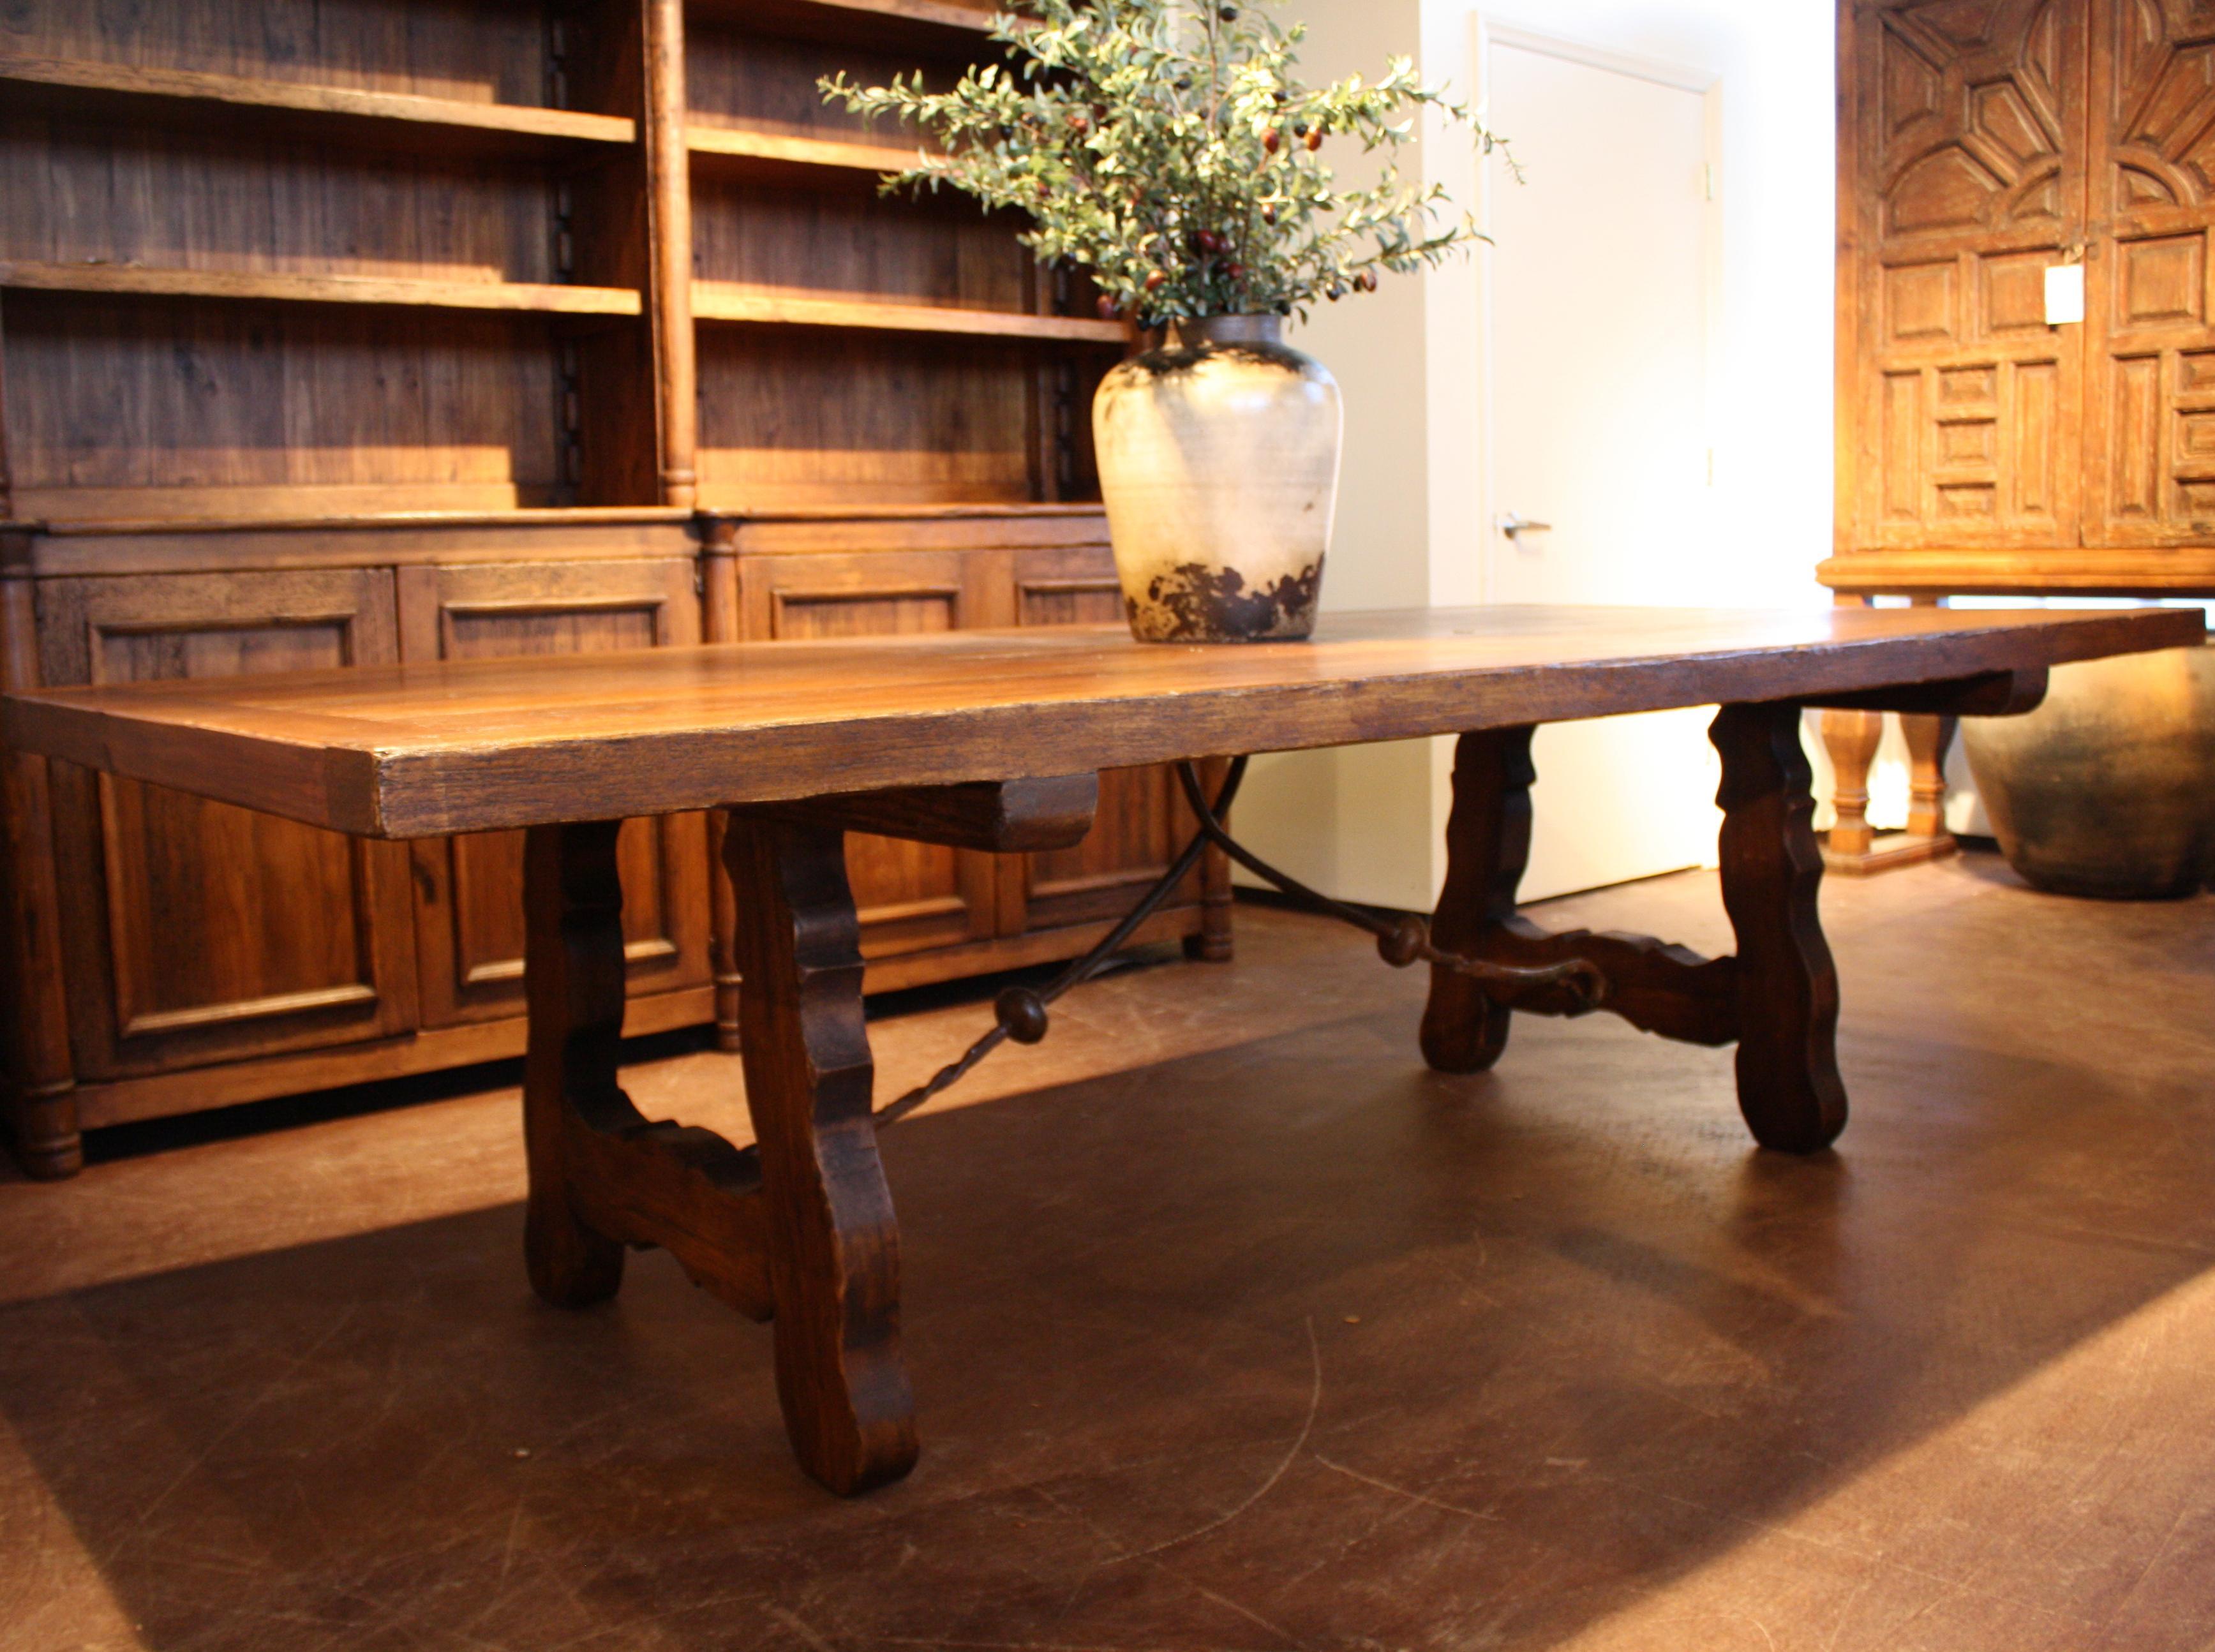 furniture source international pastora fsi comes26 traditional trestle wood dining table great. Black Bedroom Furniture Sets. Home Design Ideas